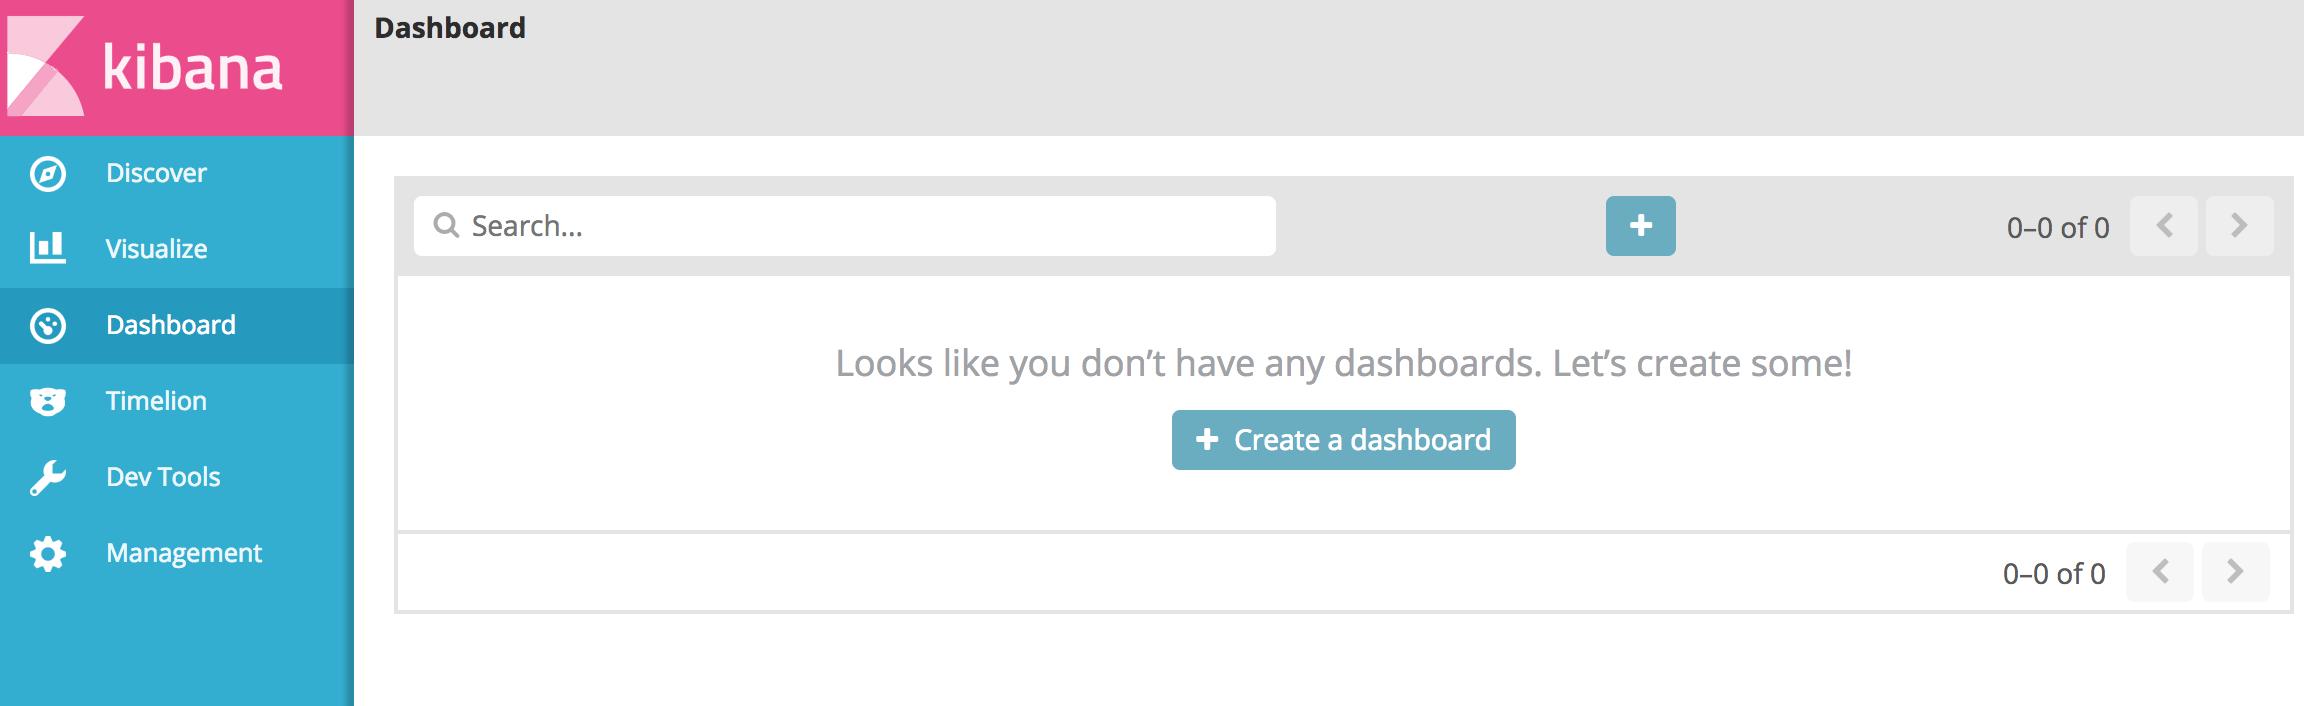 Building a Dashboard | Kibana User Guide [6 0] | Elastic